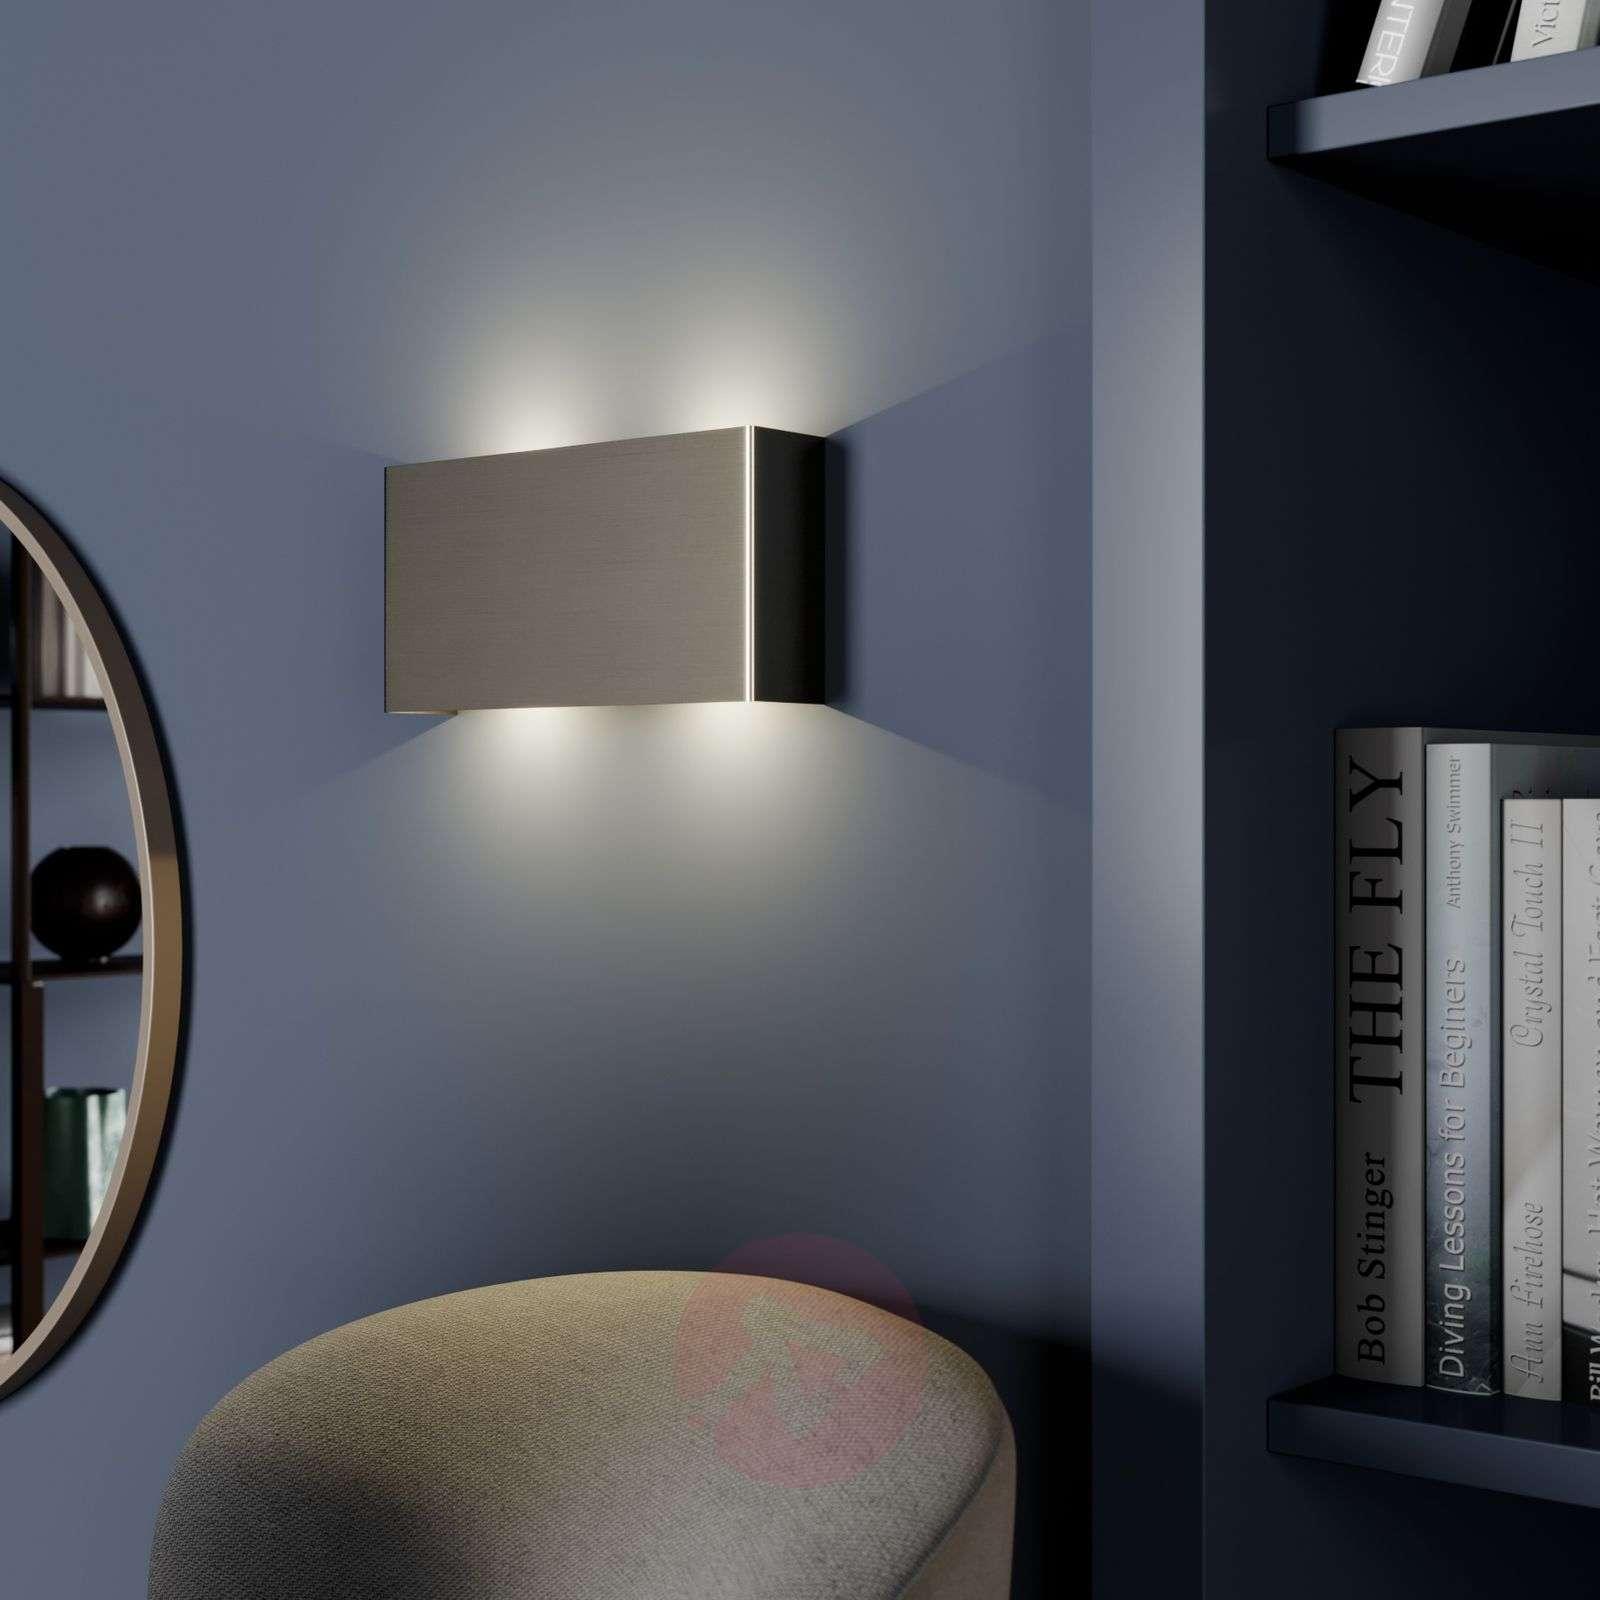 Maja dimmable LED wall light 22cm-6722151-01